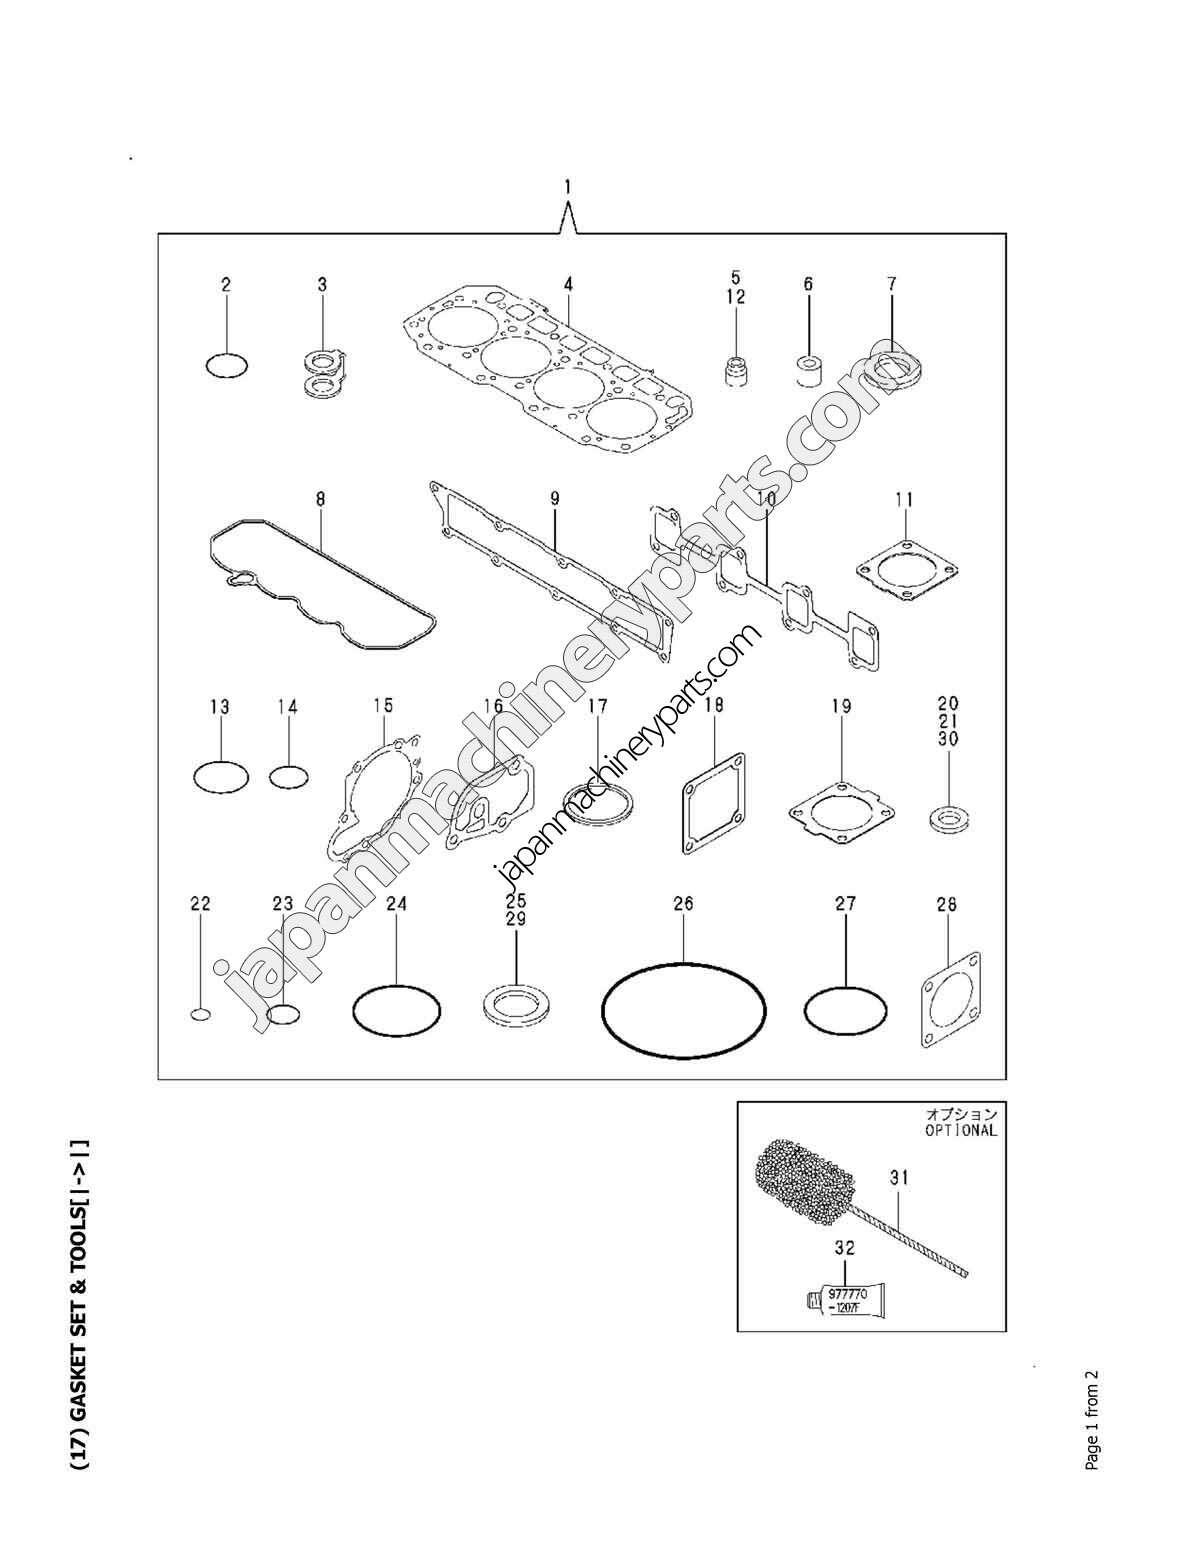 Parts for YANMAR 4TNV98-XBV